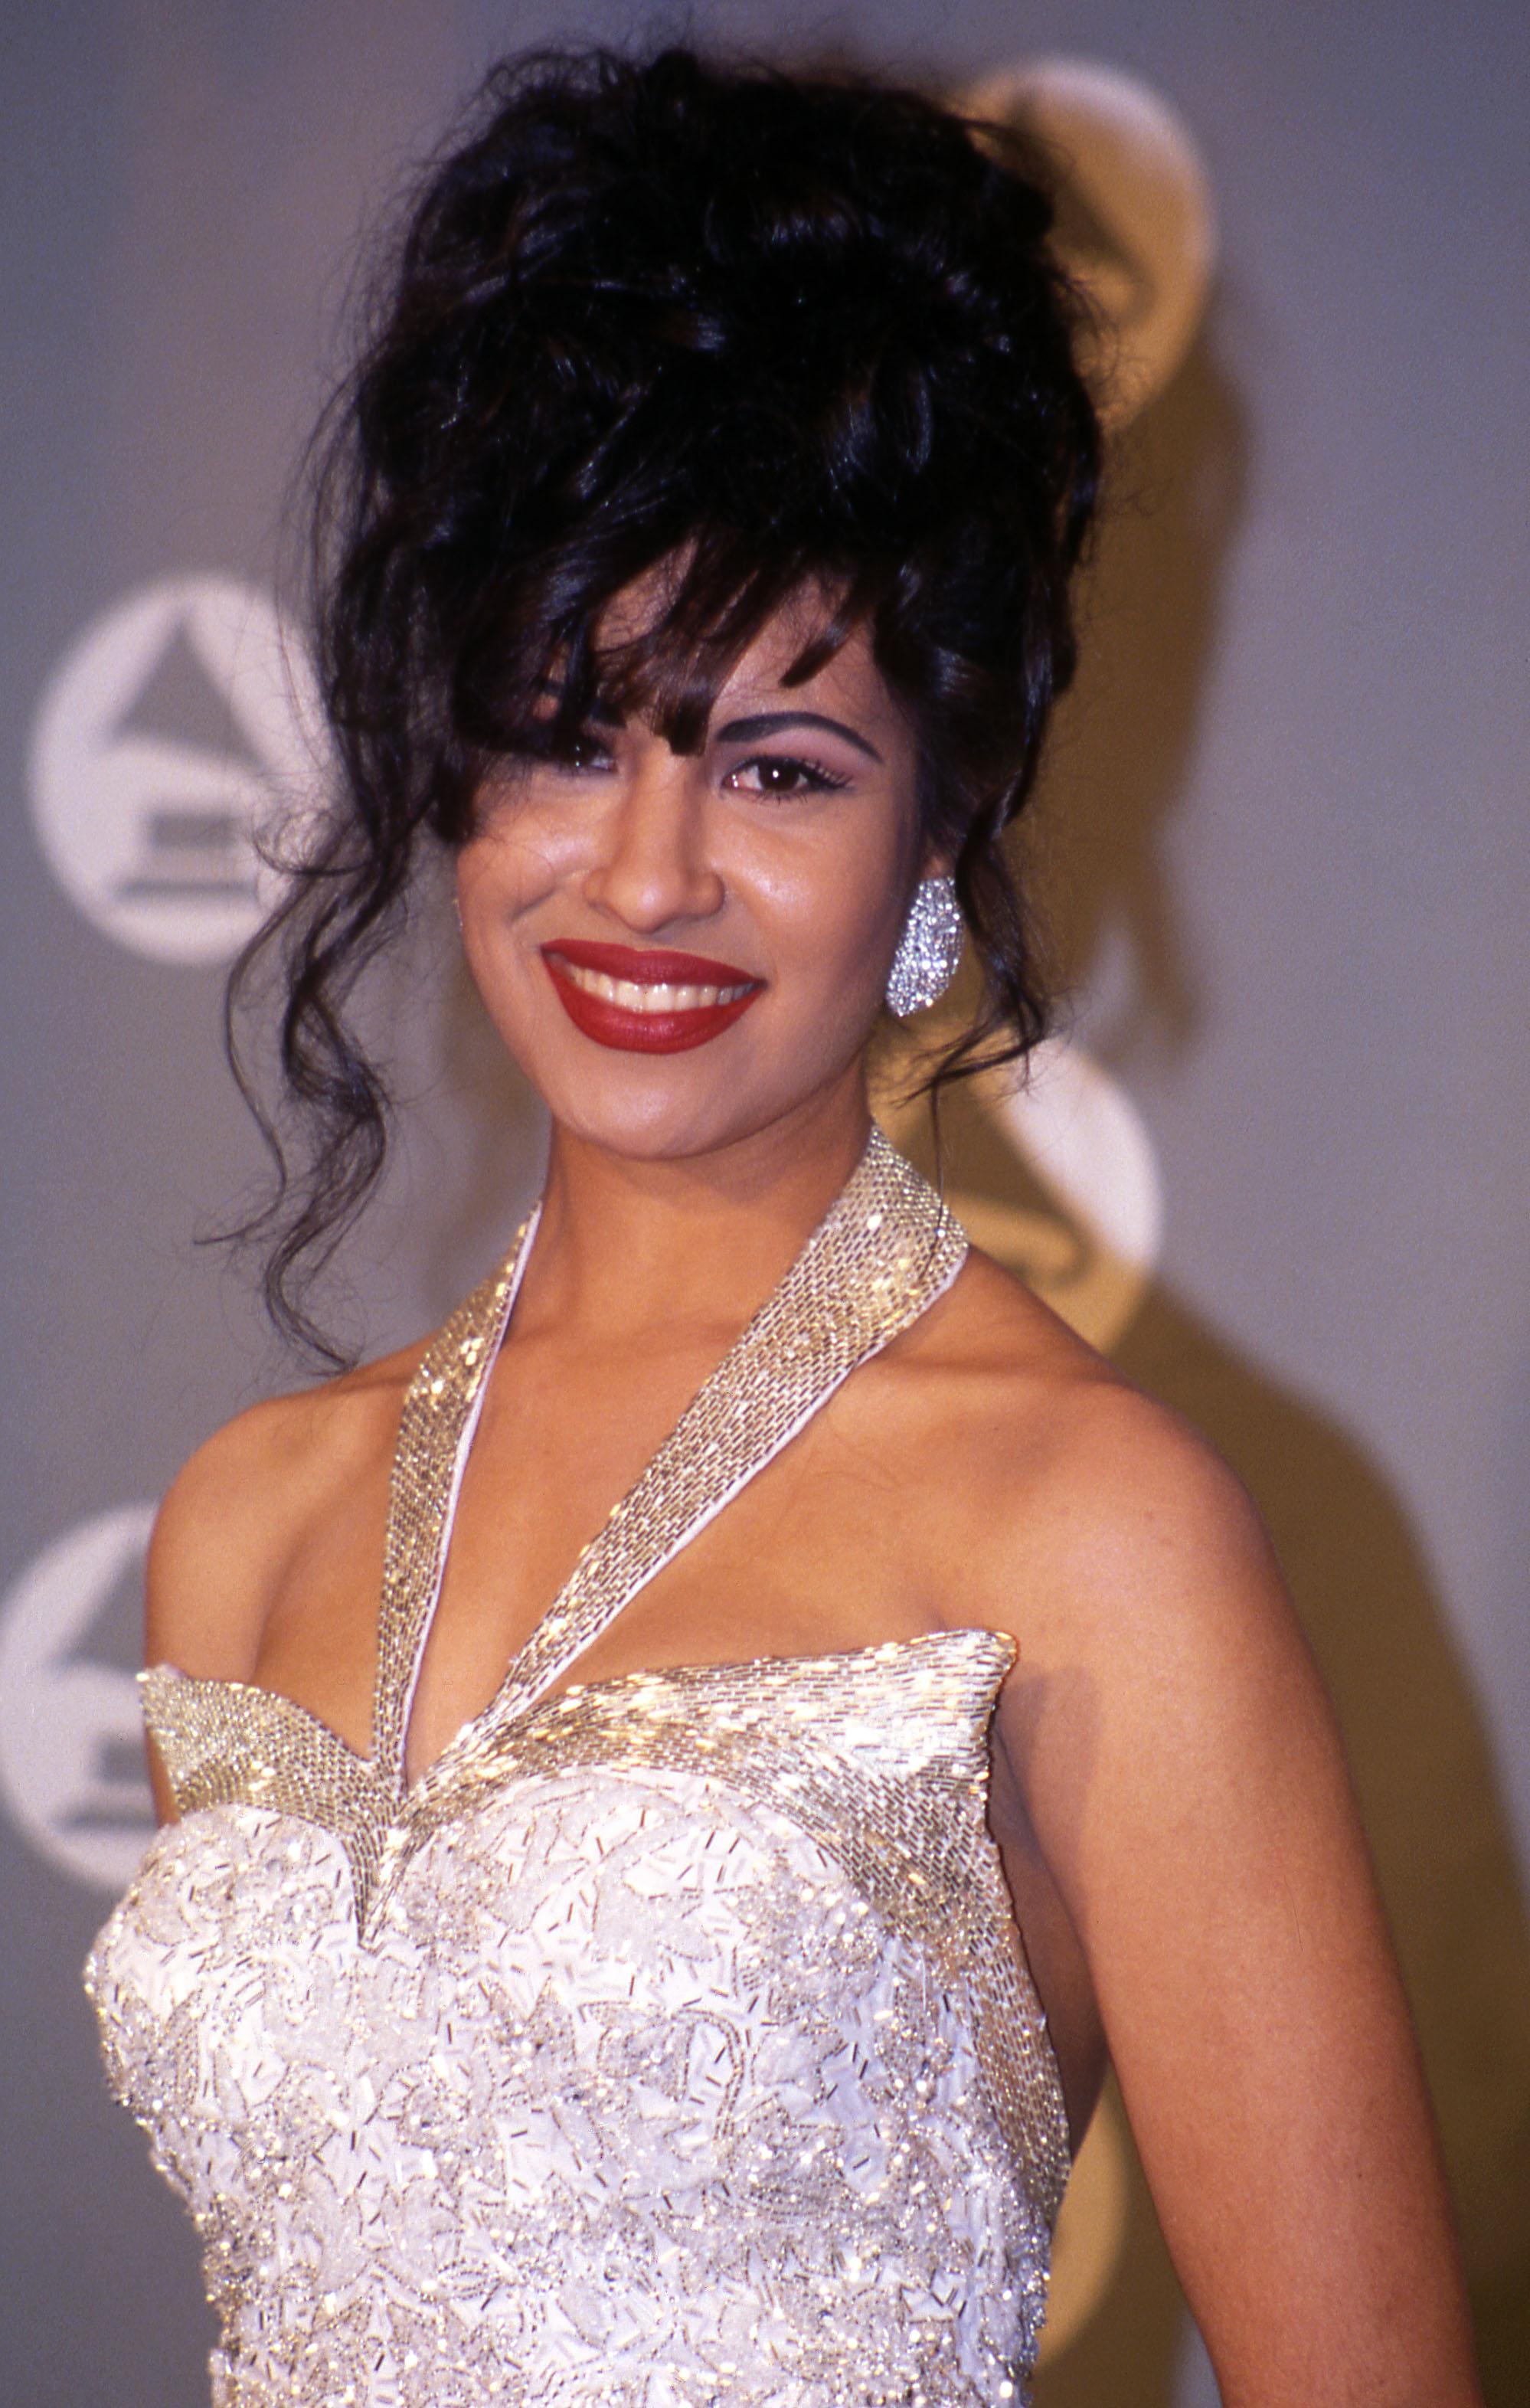 Selena at the 1994 Grammy Awards in New York City.